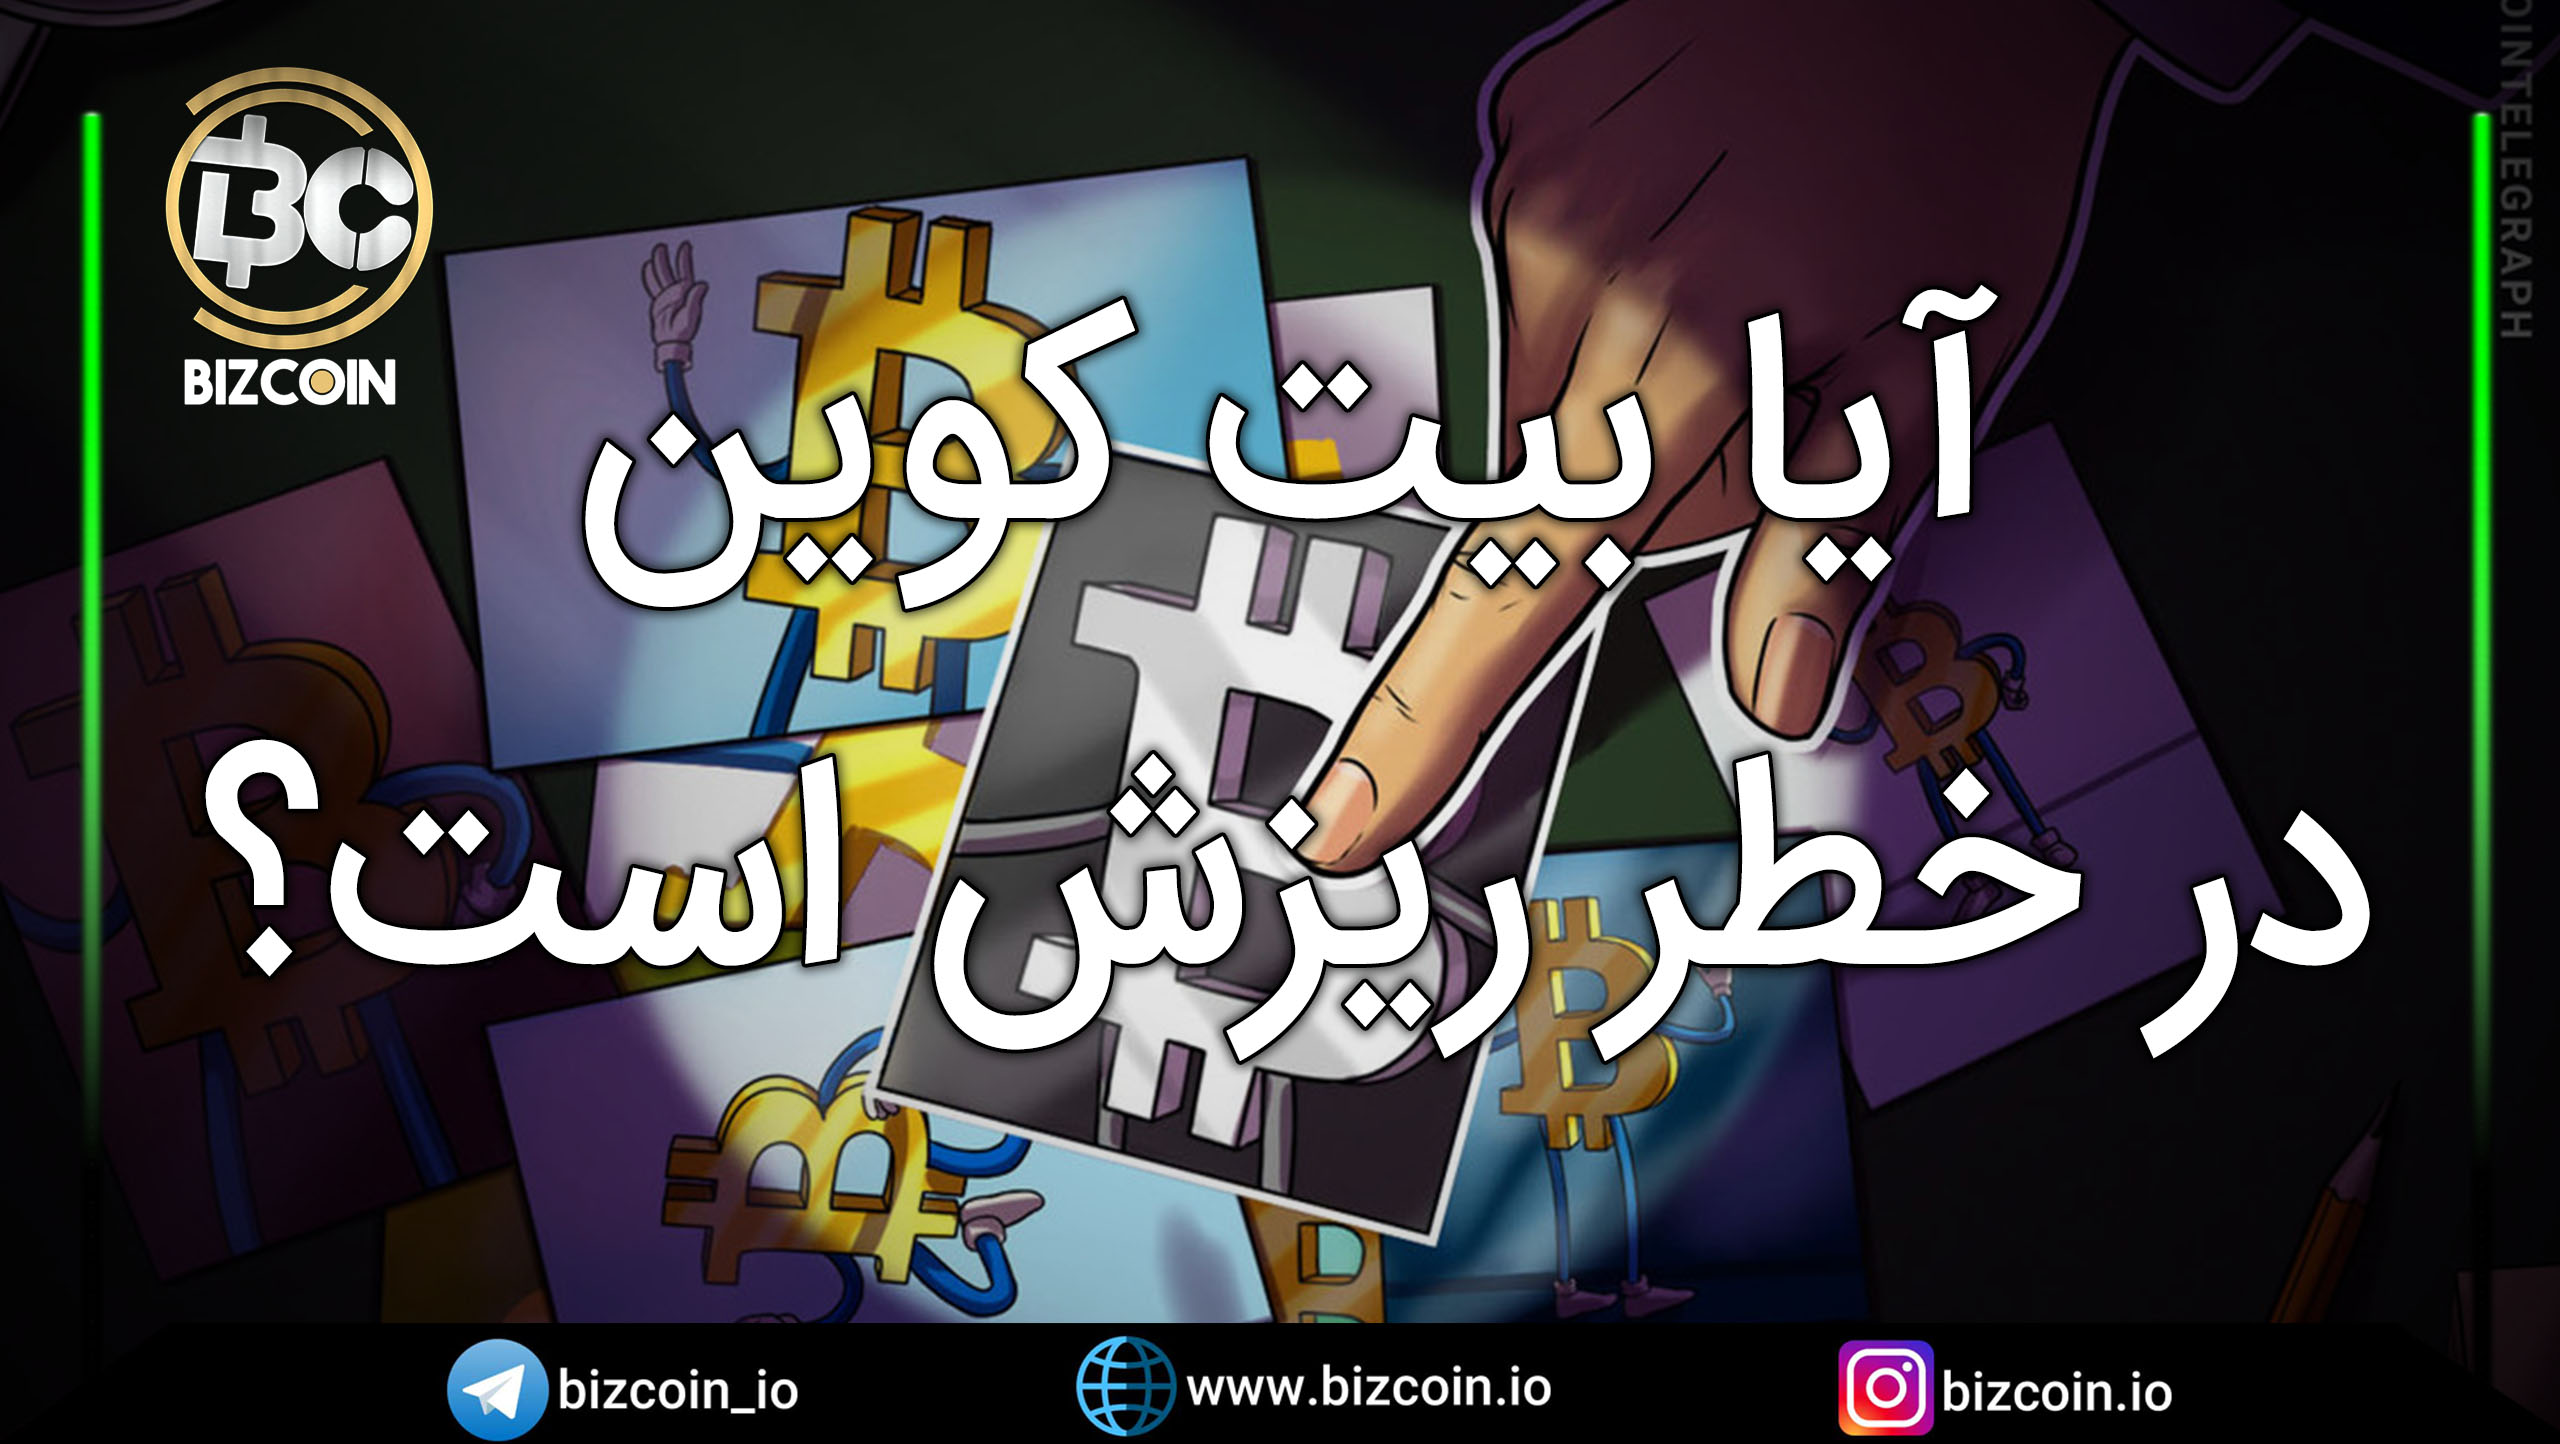 Is Bitcoin in danger of falling آیا بیت کوین در خطر ریزش است؟